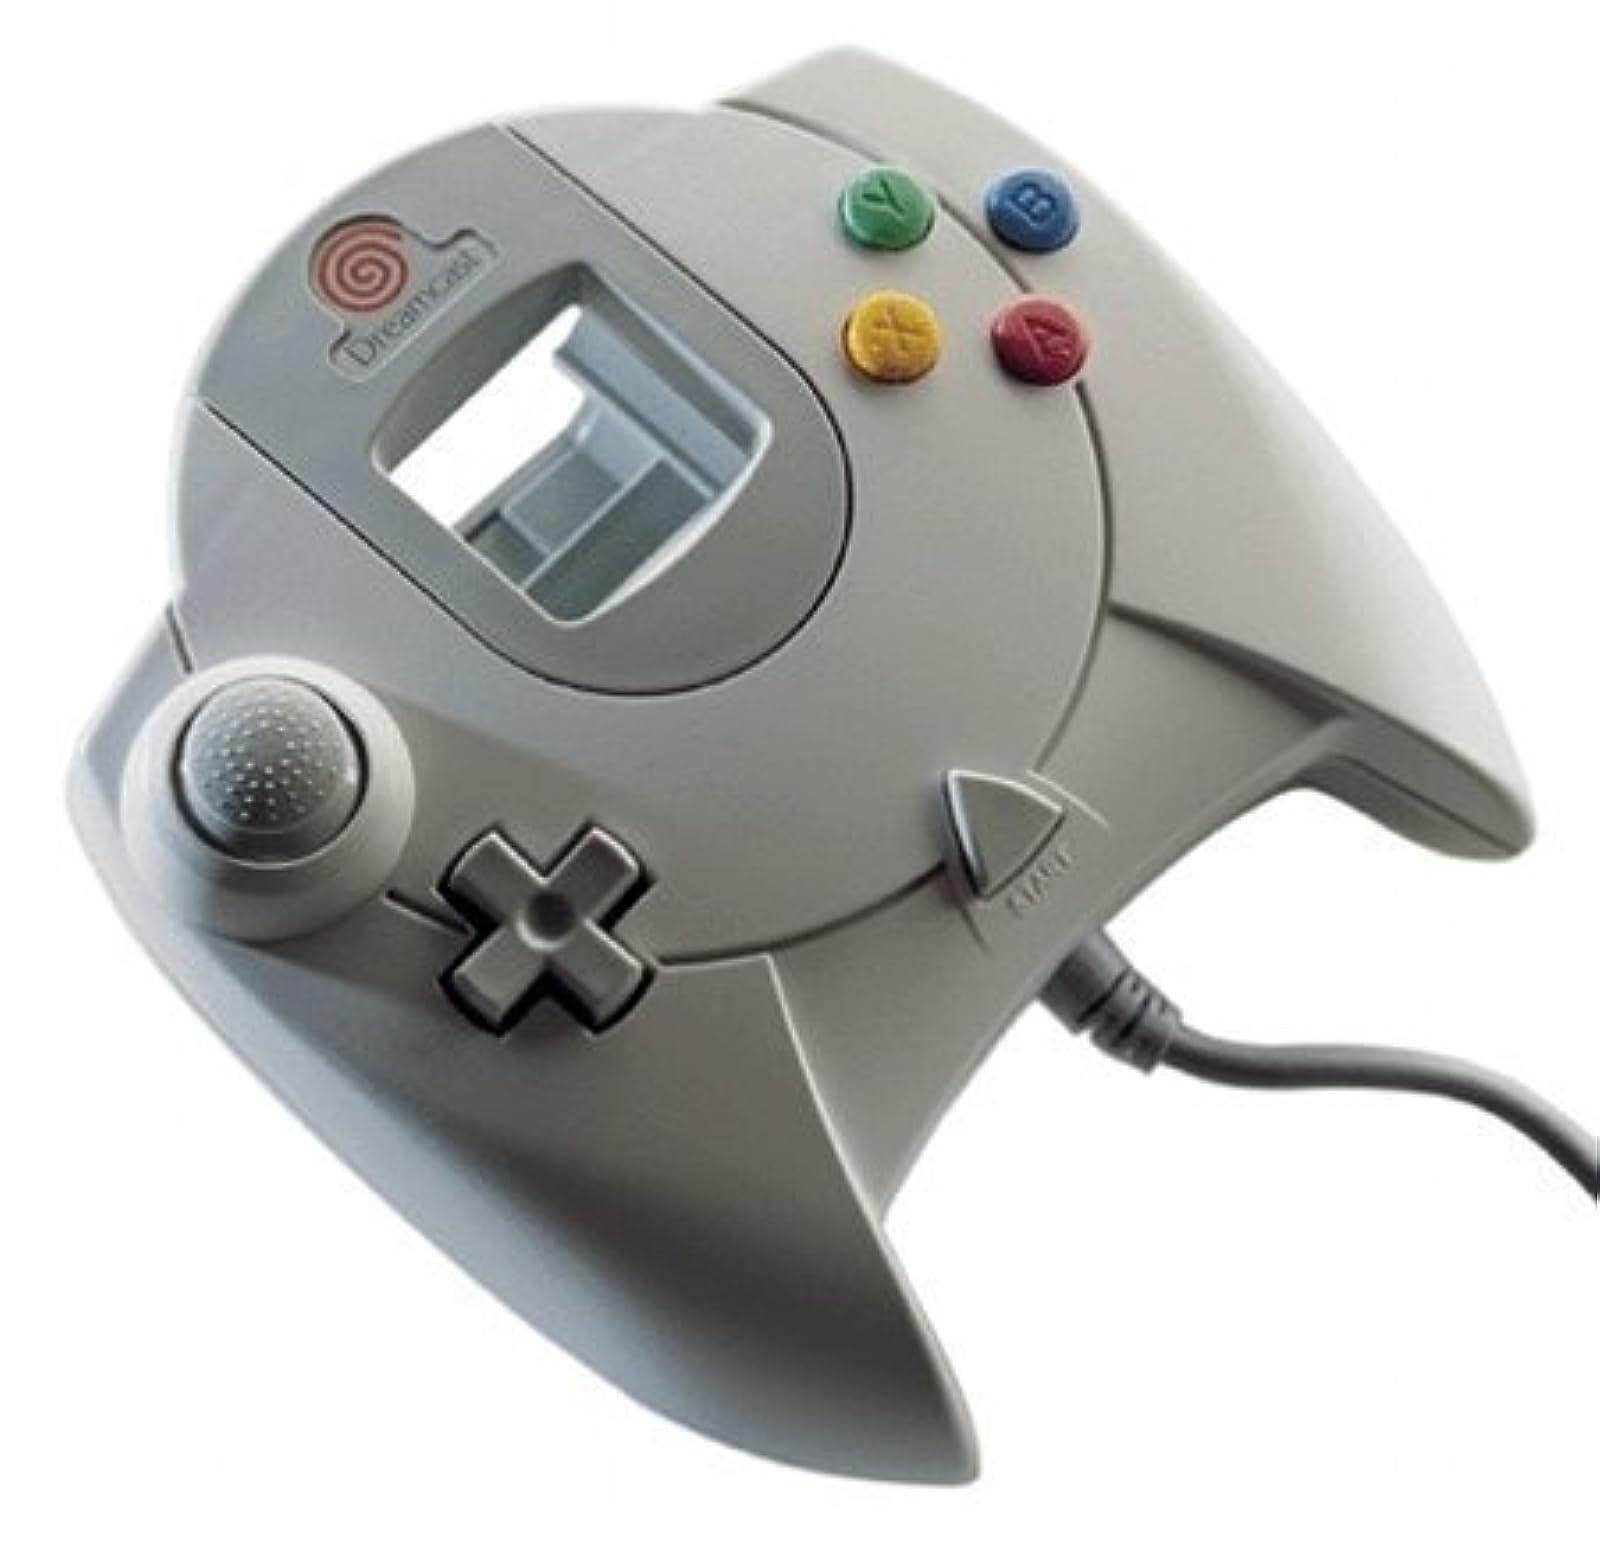 Sega Dreamcast OEM Controller Original Gray